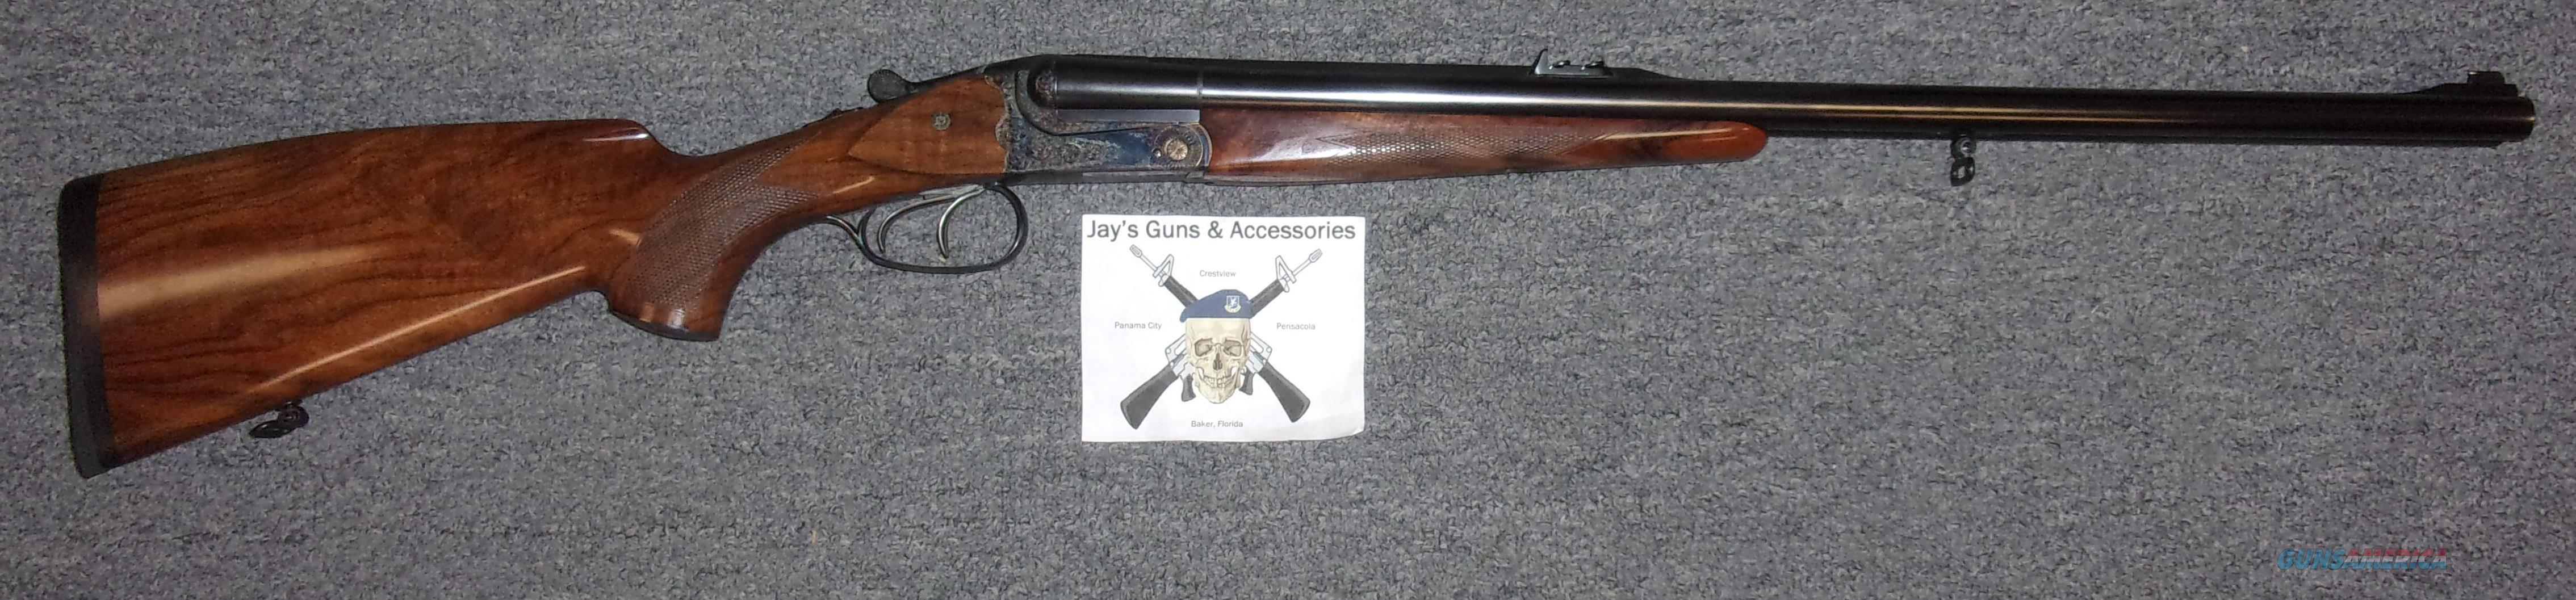 Merkel Doppelbüchse Double Rifle in .470 Nitro Express  Guns > Rifles > Merkel Rifles